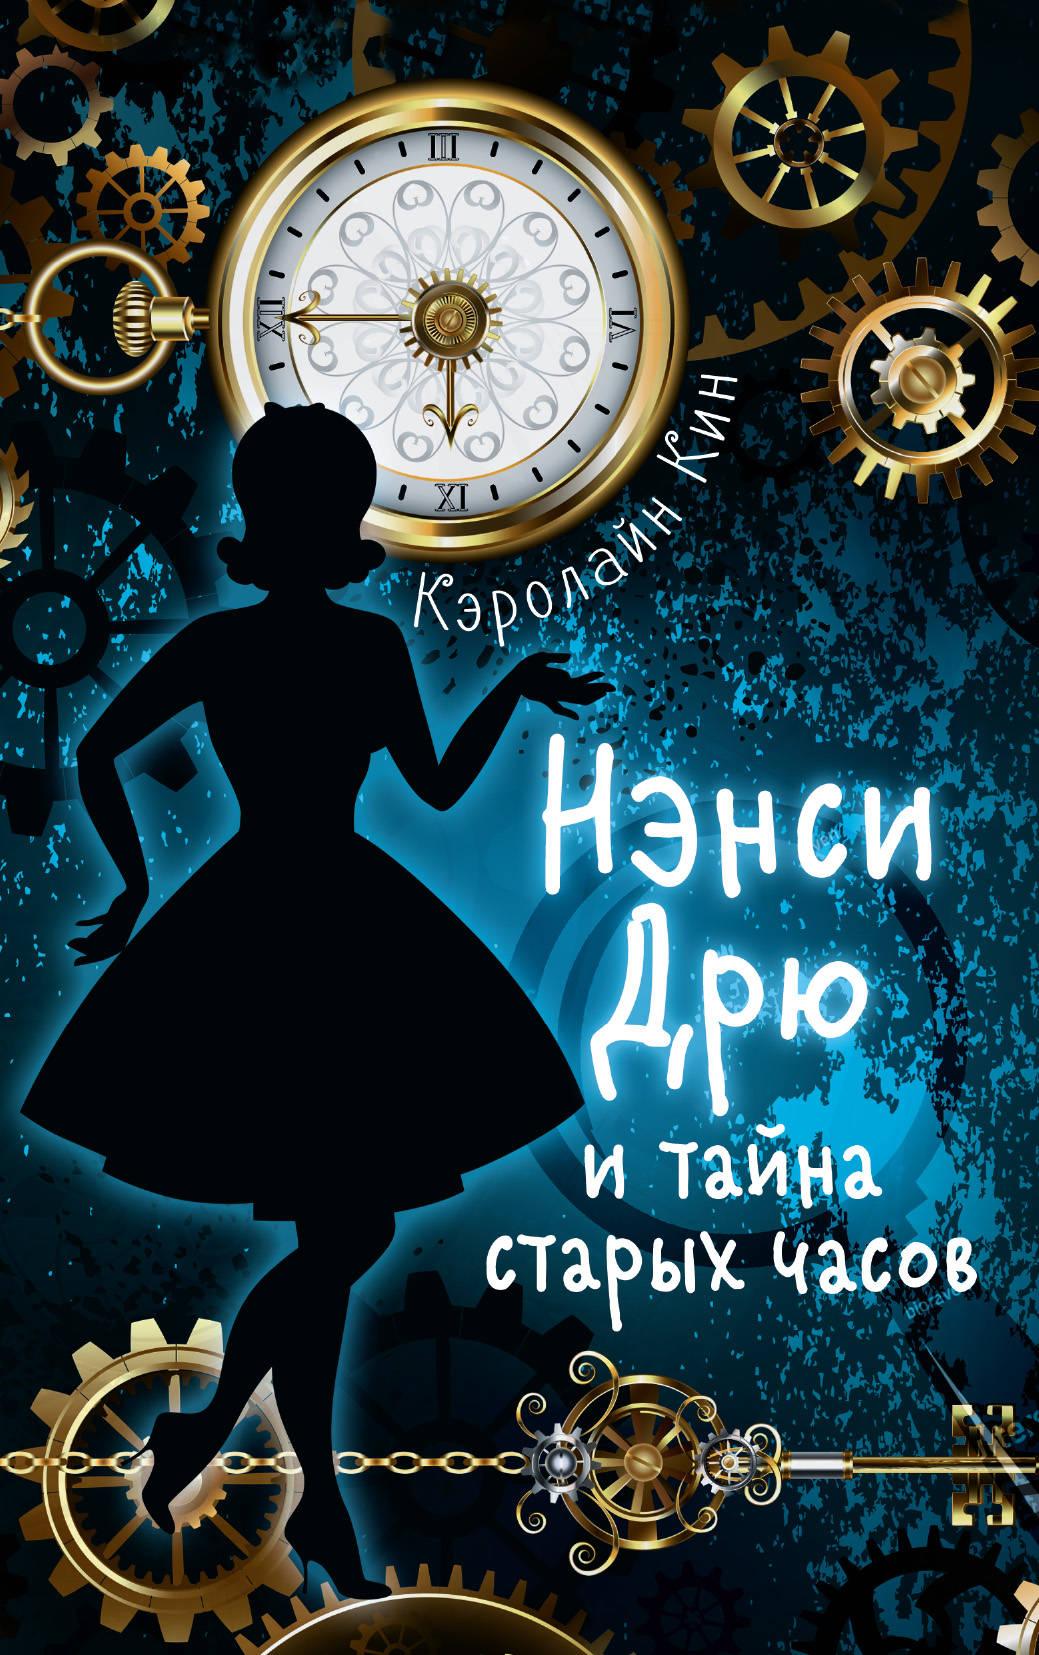 Нэнси Дрю и тайна старых часов - Кэролайн Кин